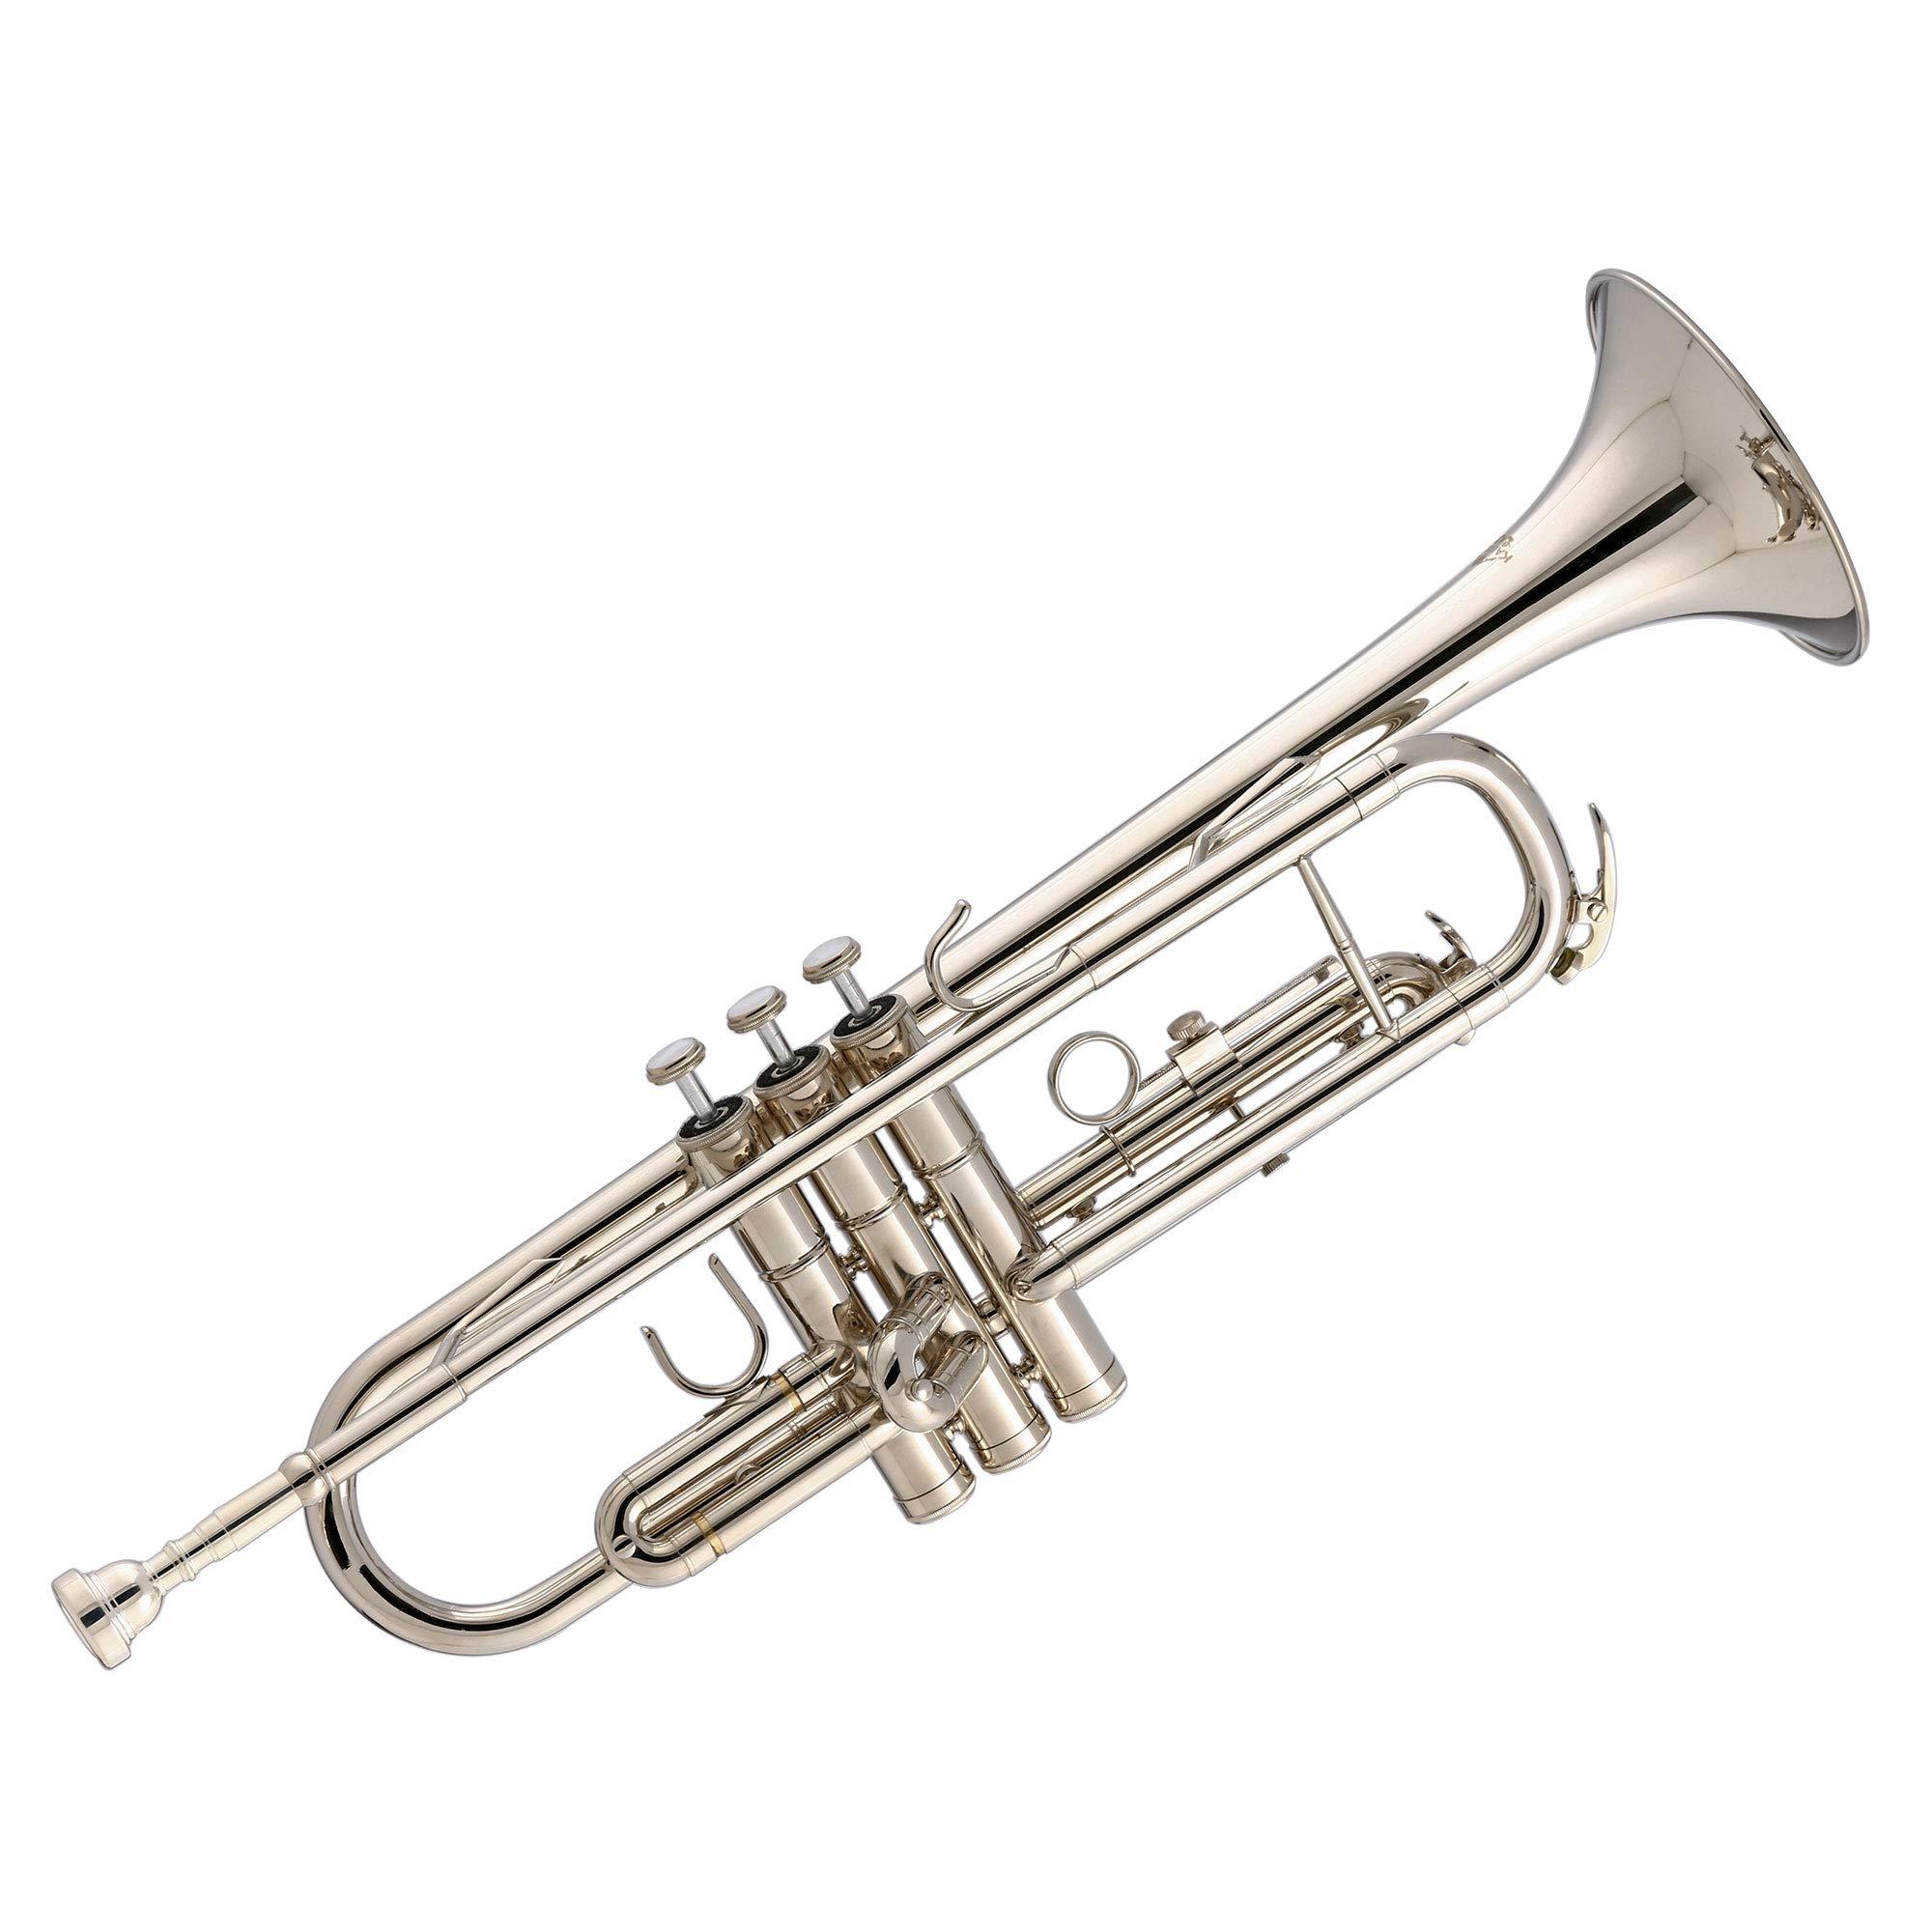 Kaizer TRP-1000NK Standard B Flat Bb Student Trumpet - Nickel Silver